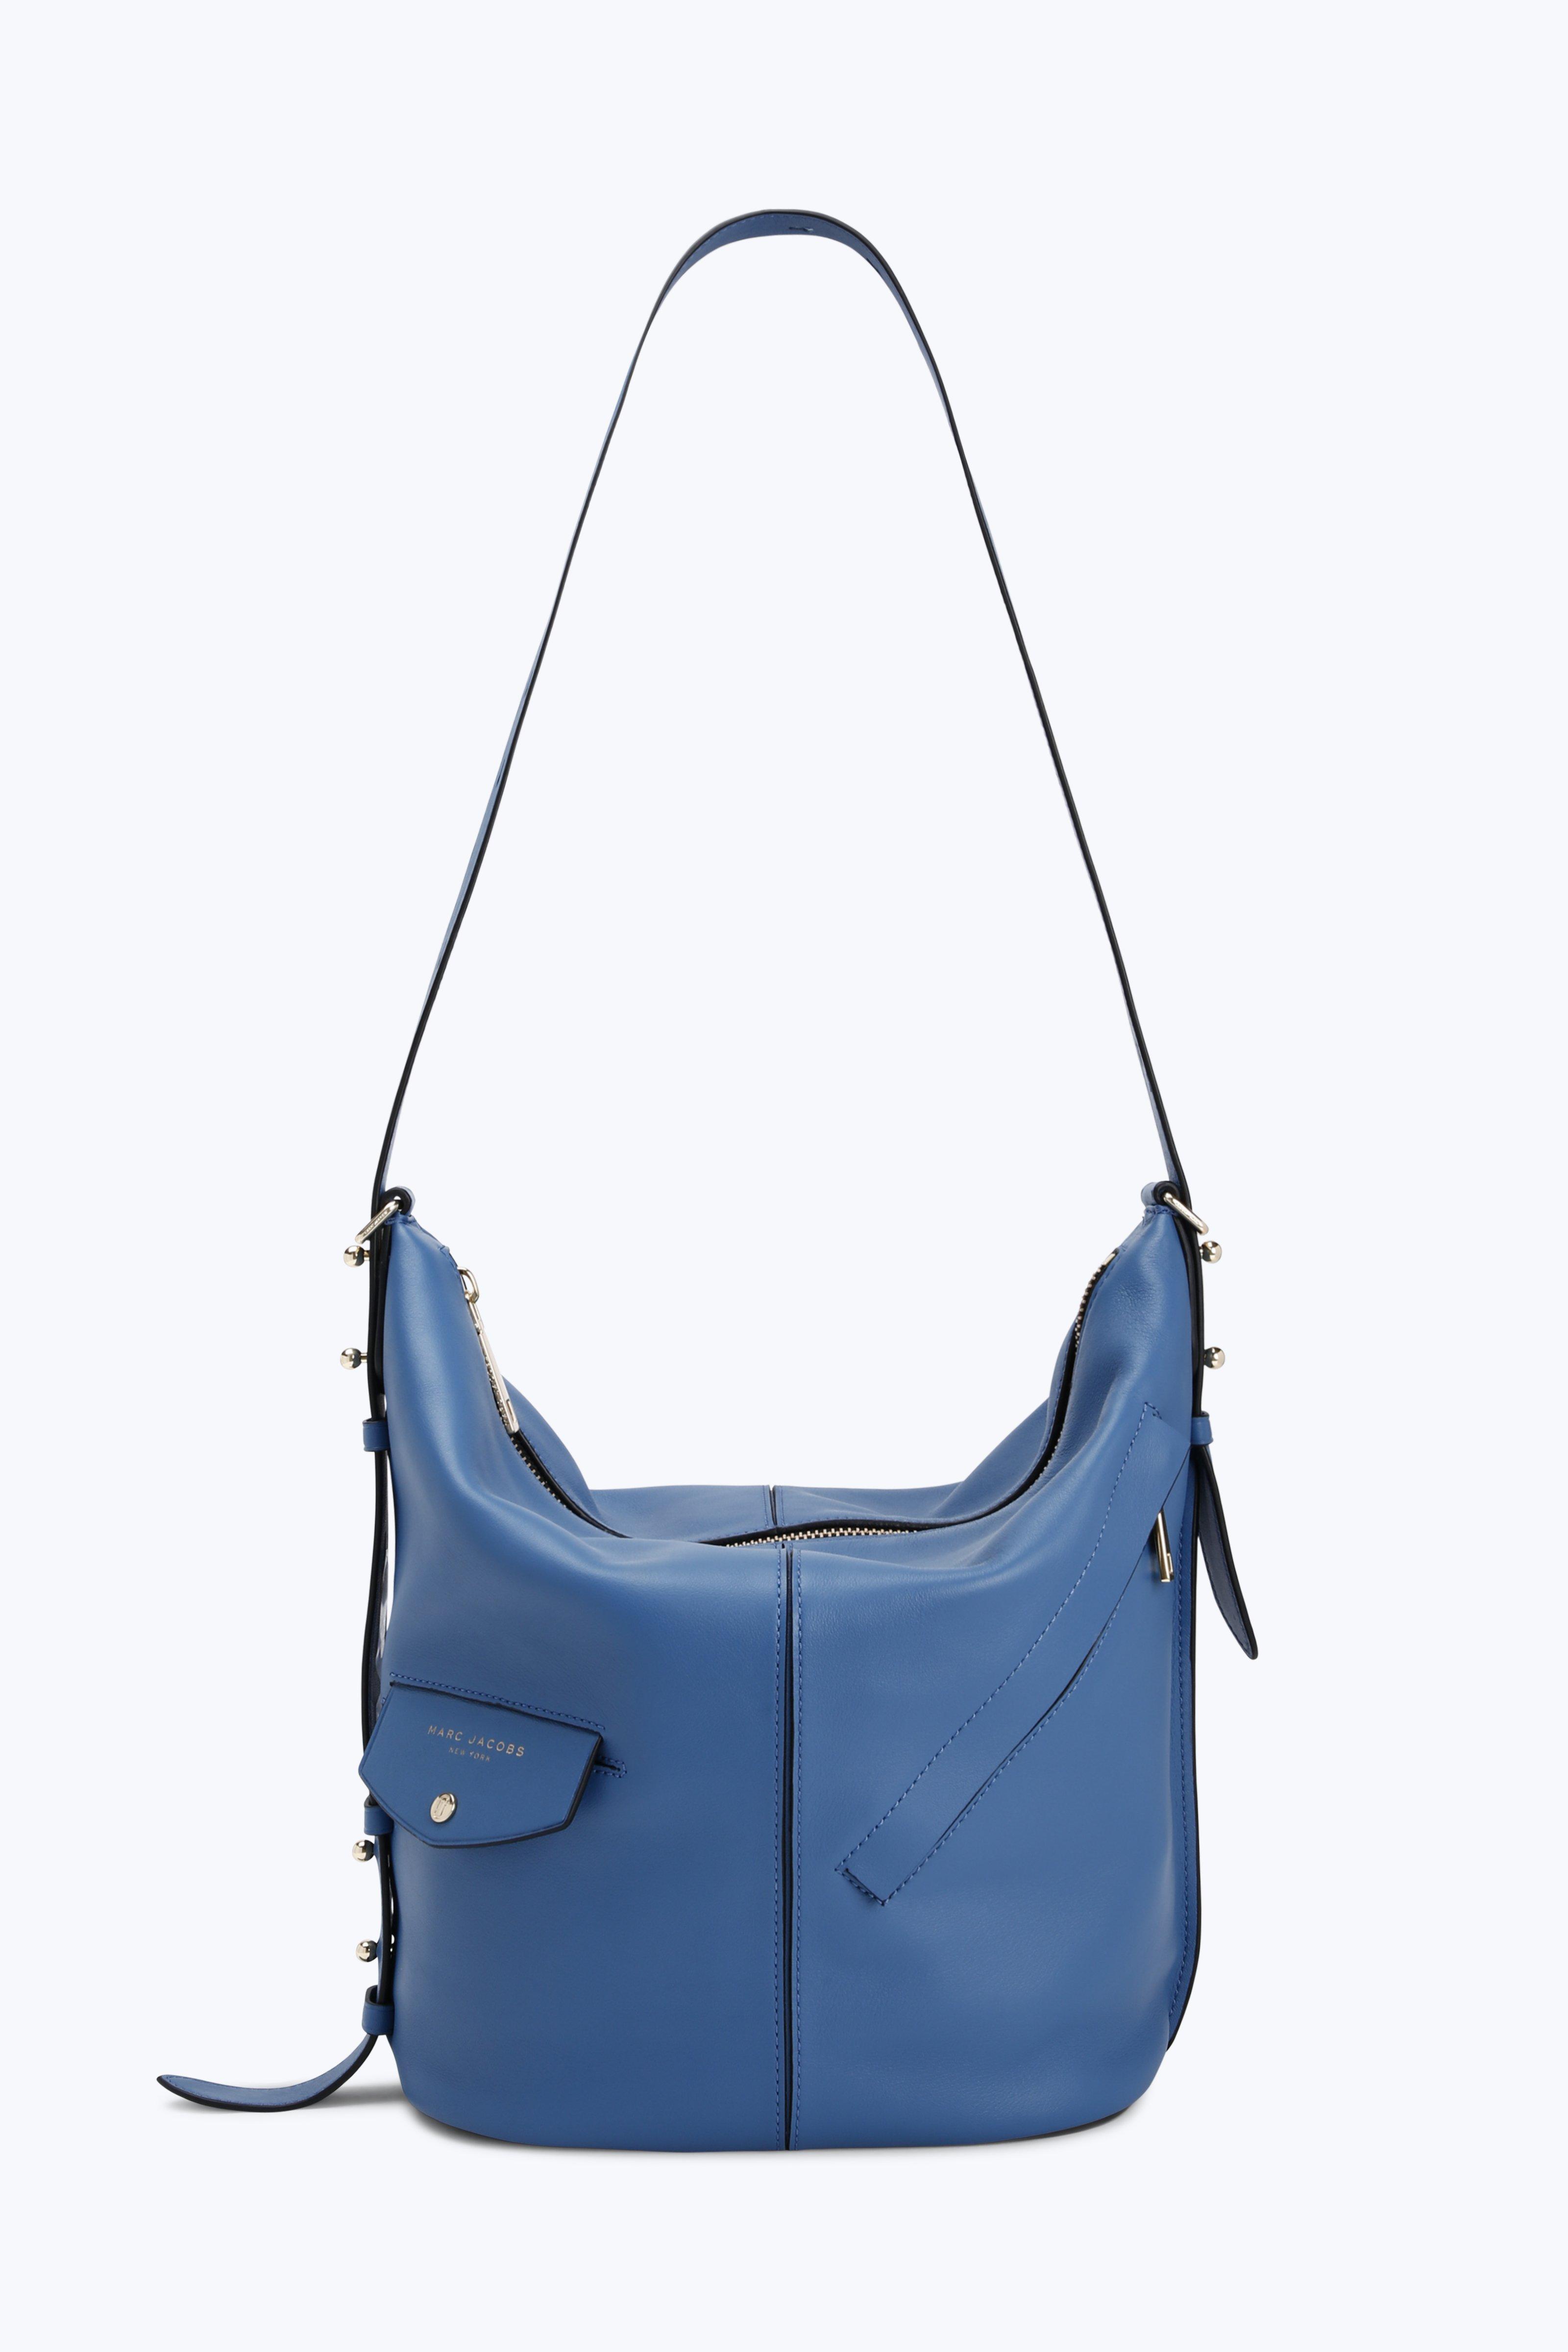 The Sling Bag